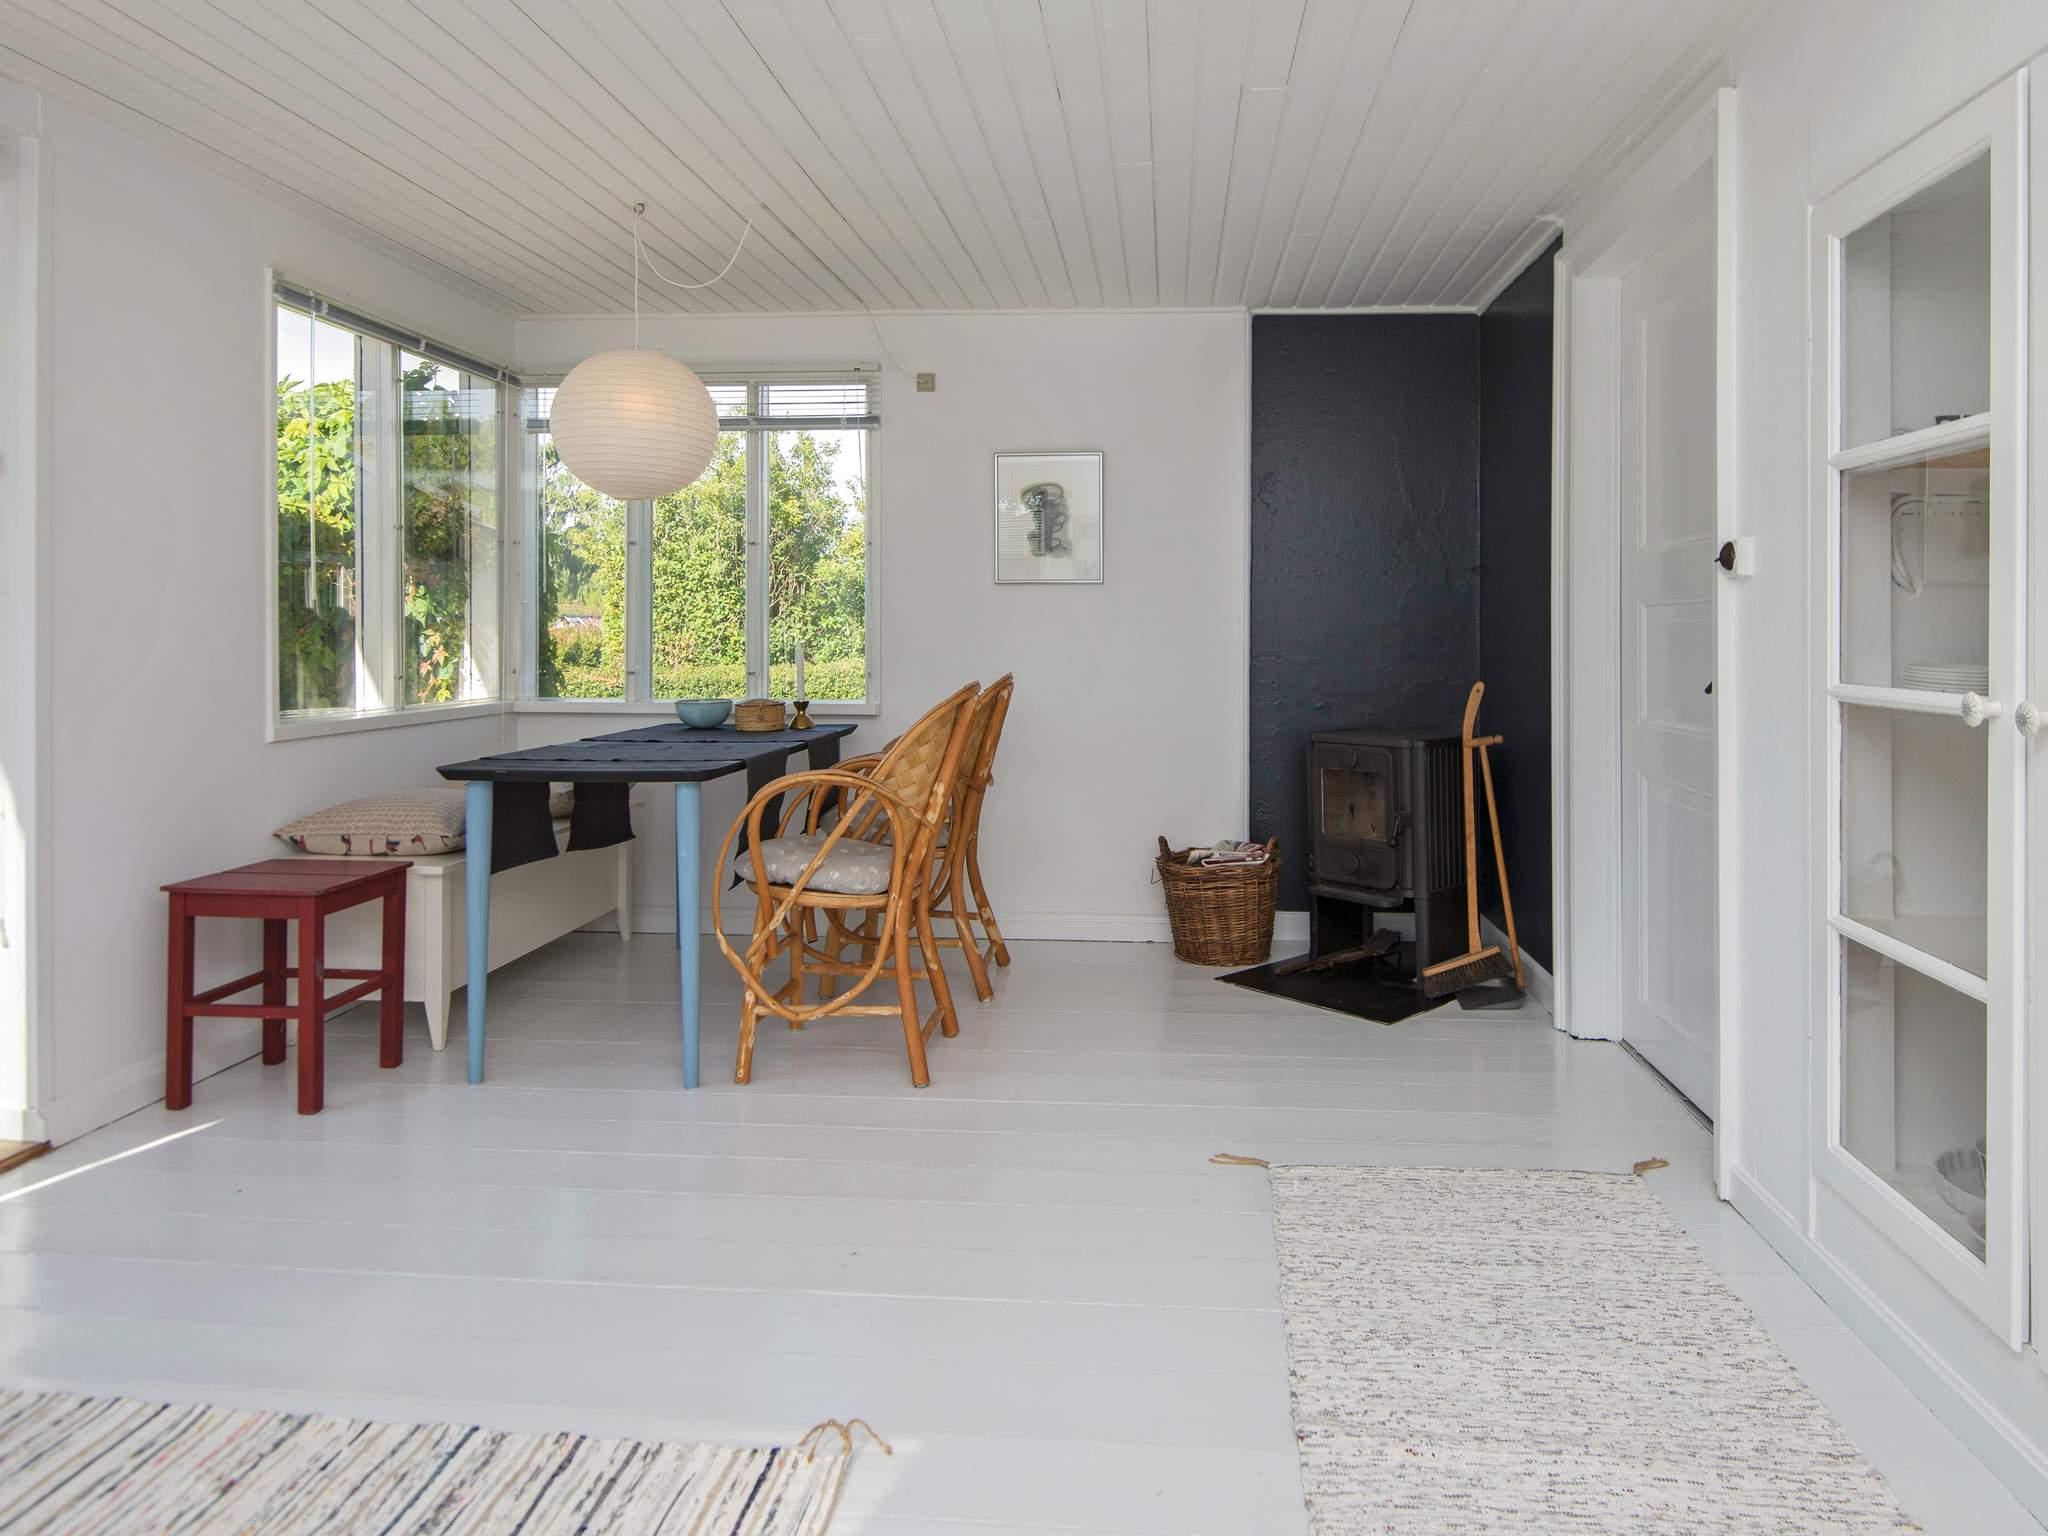 Ferienhaus Ajstrup Strand/Malling (2435075), Ajstrup, , Ostjütland, Dänemark, Bild 6